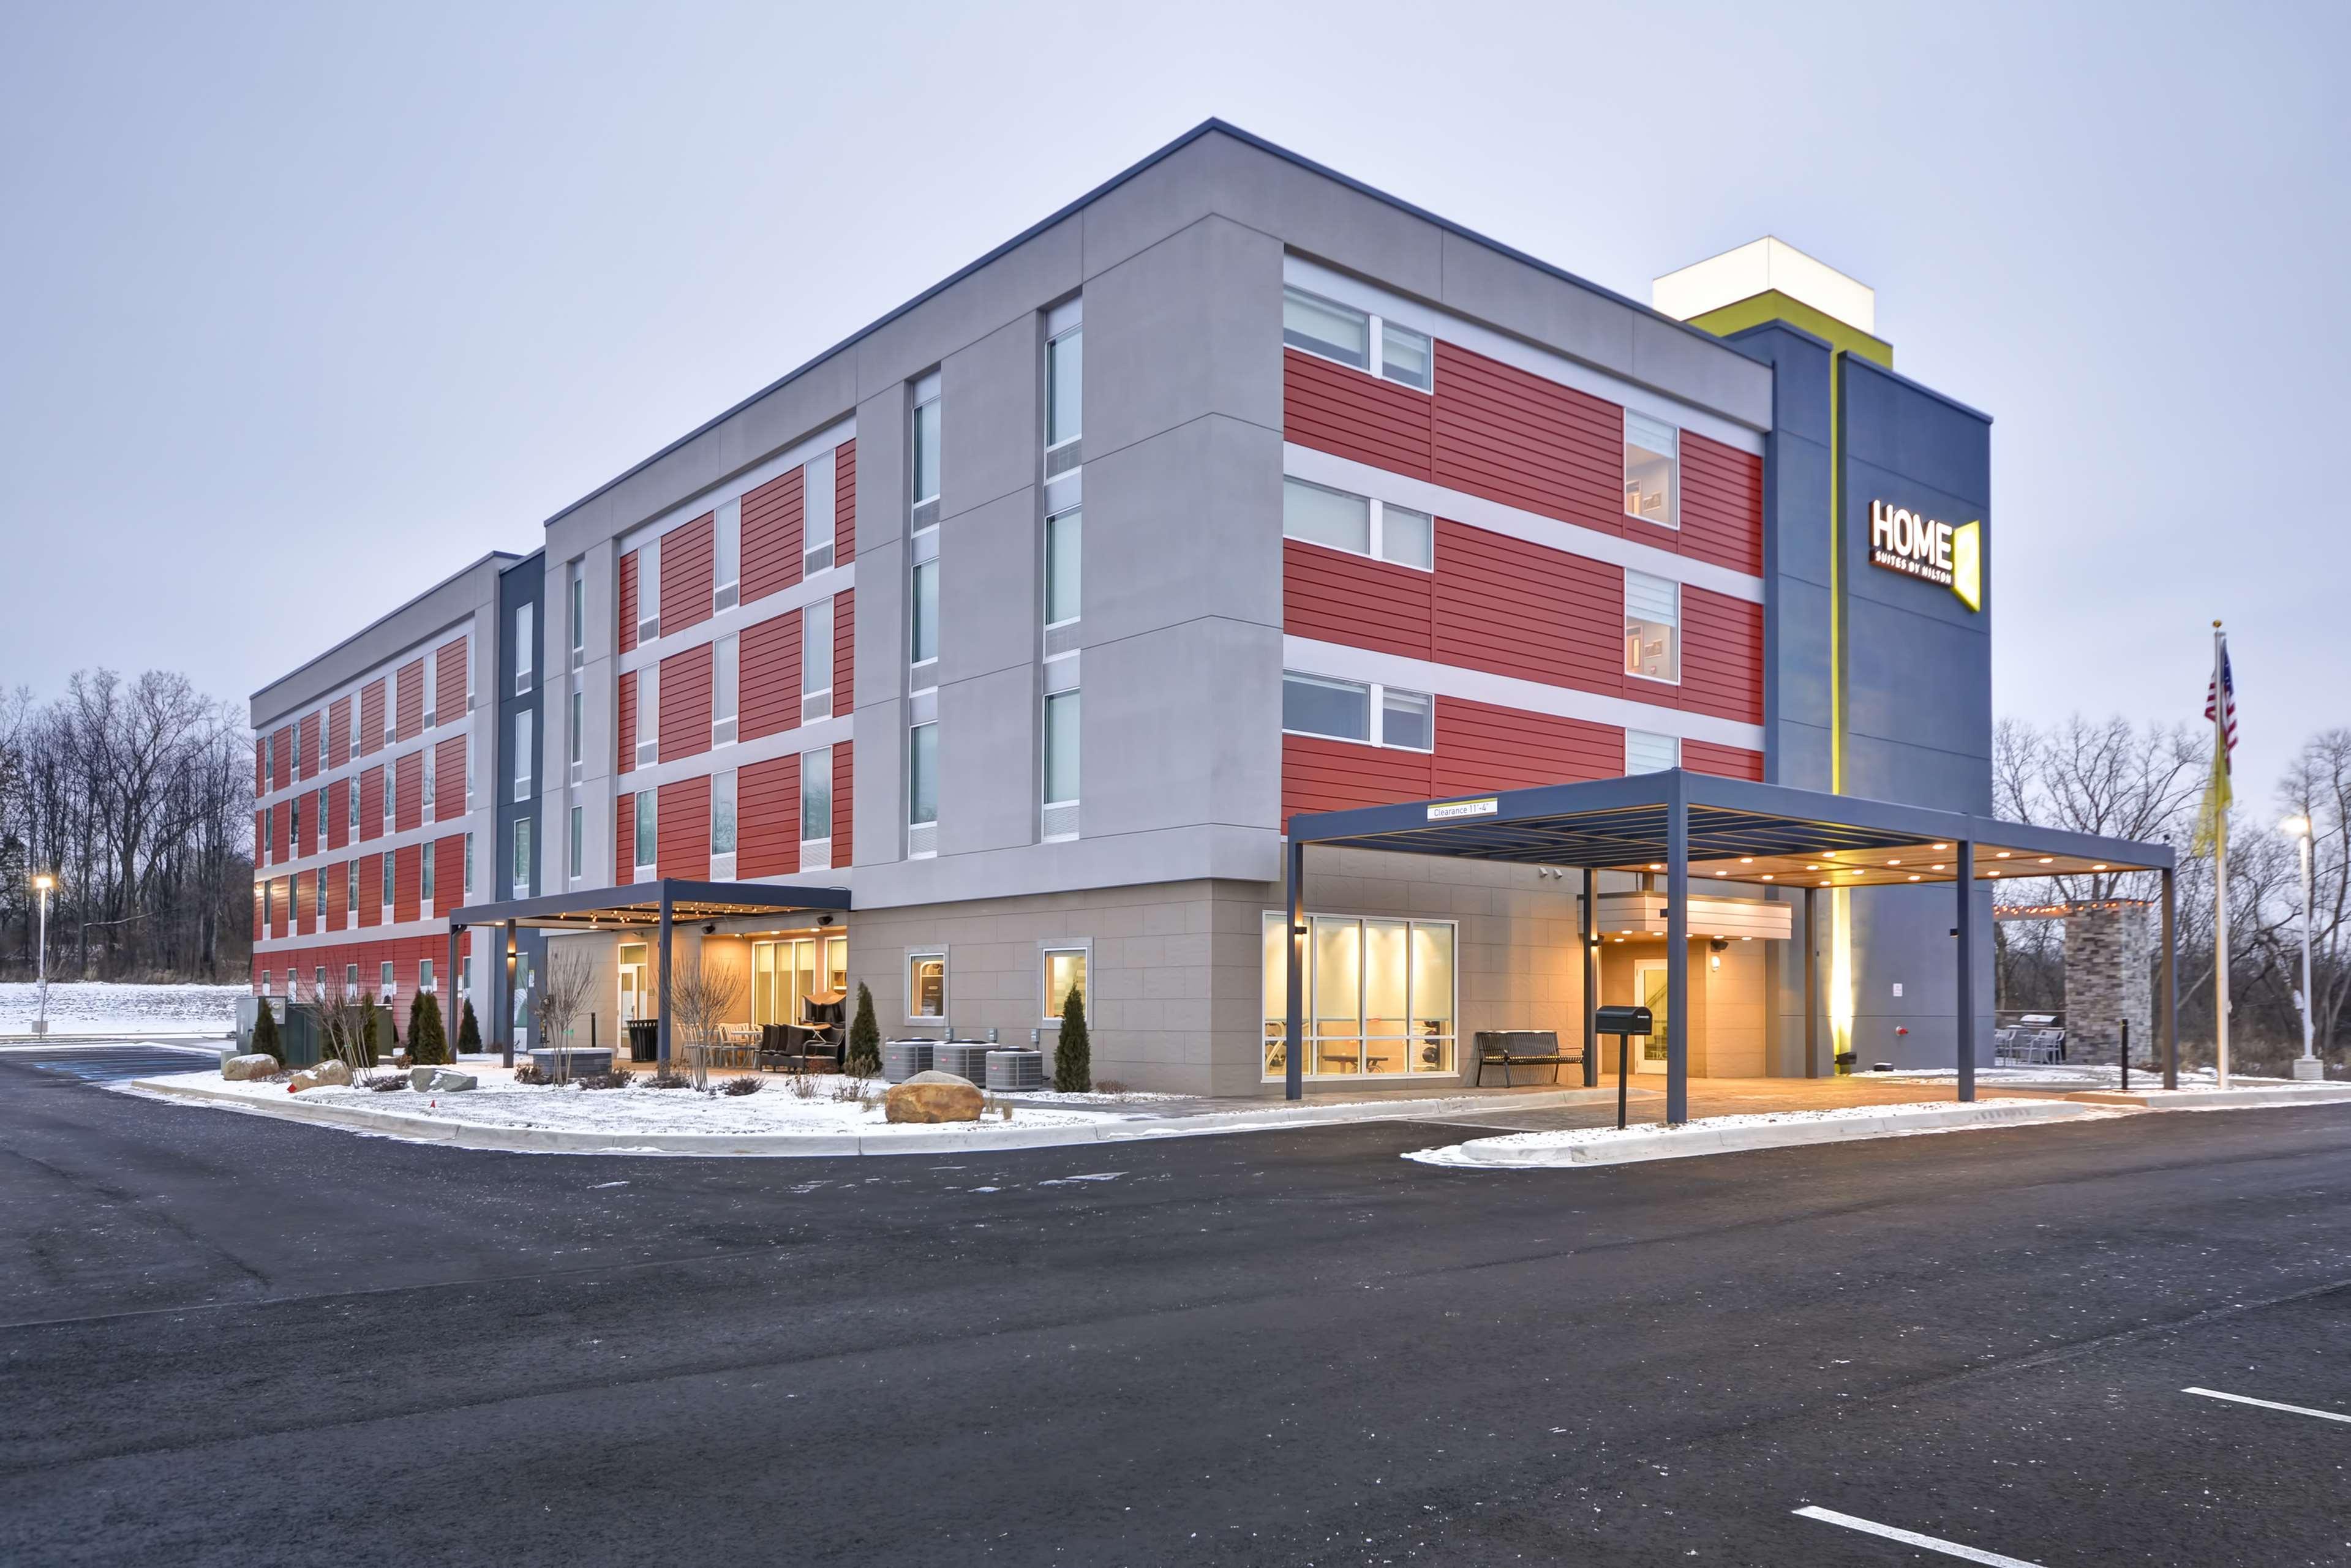 Home2 Suites by Hilton Jackson image 1